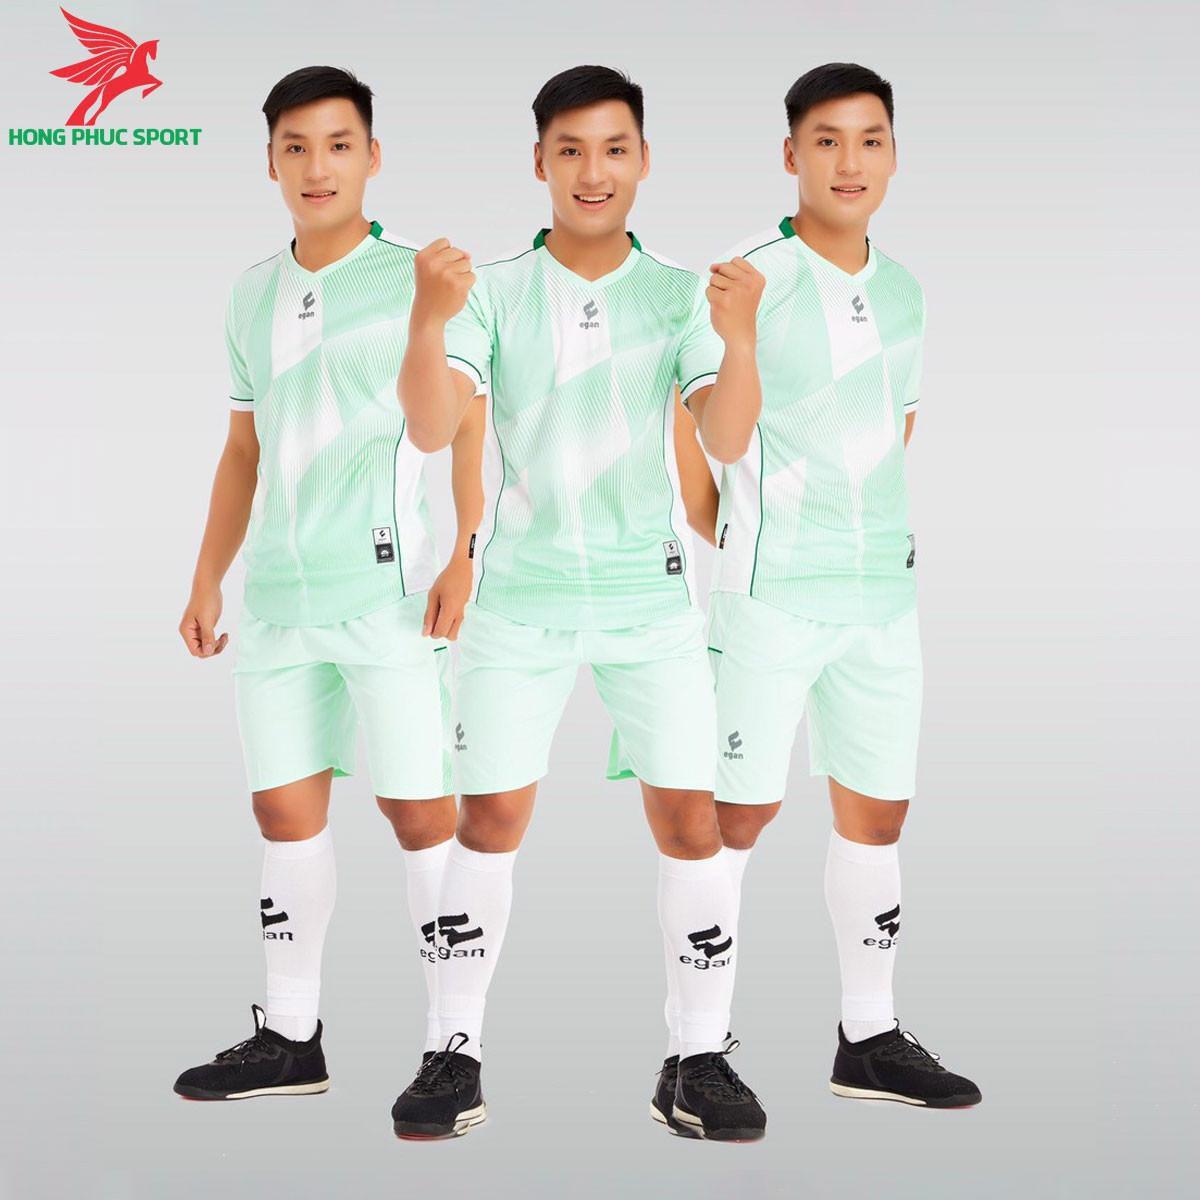 https://cdn.hongphucsport.com/unsafe/s4.shopbay.vn/files/285/ao-da-bong-khong-logo-egan-victory-mau-xanh-ngoc-6050852d4403f.jpg